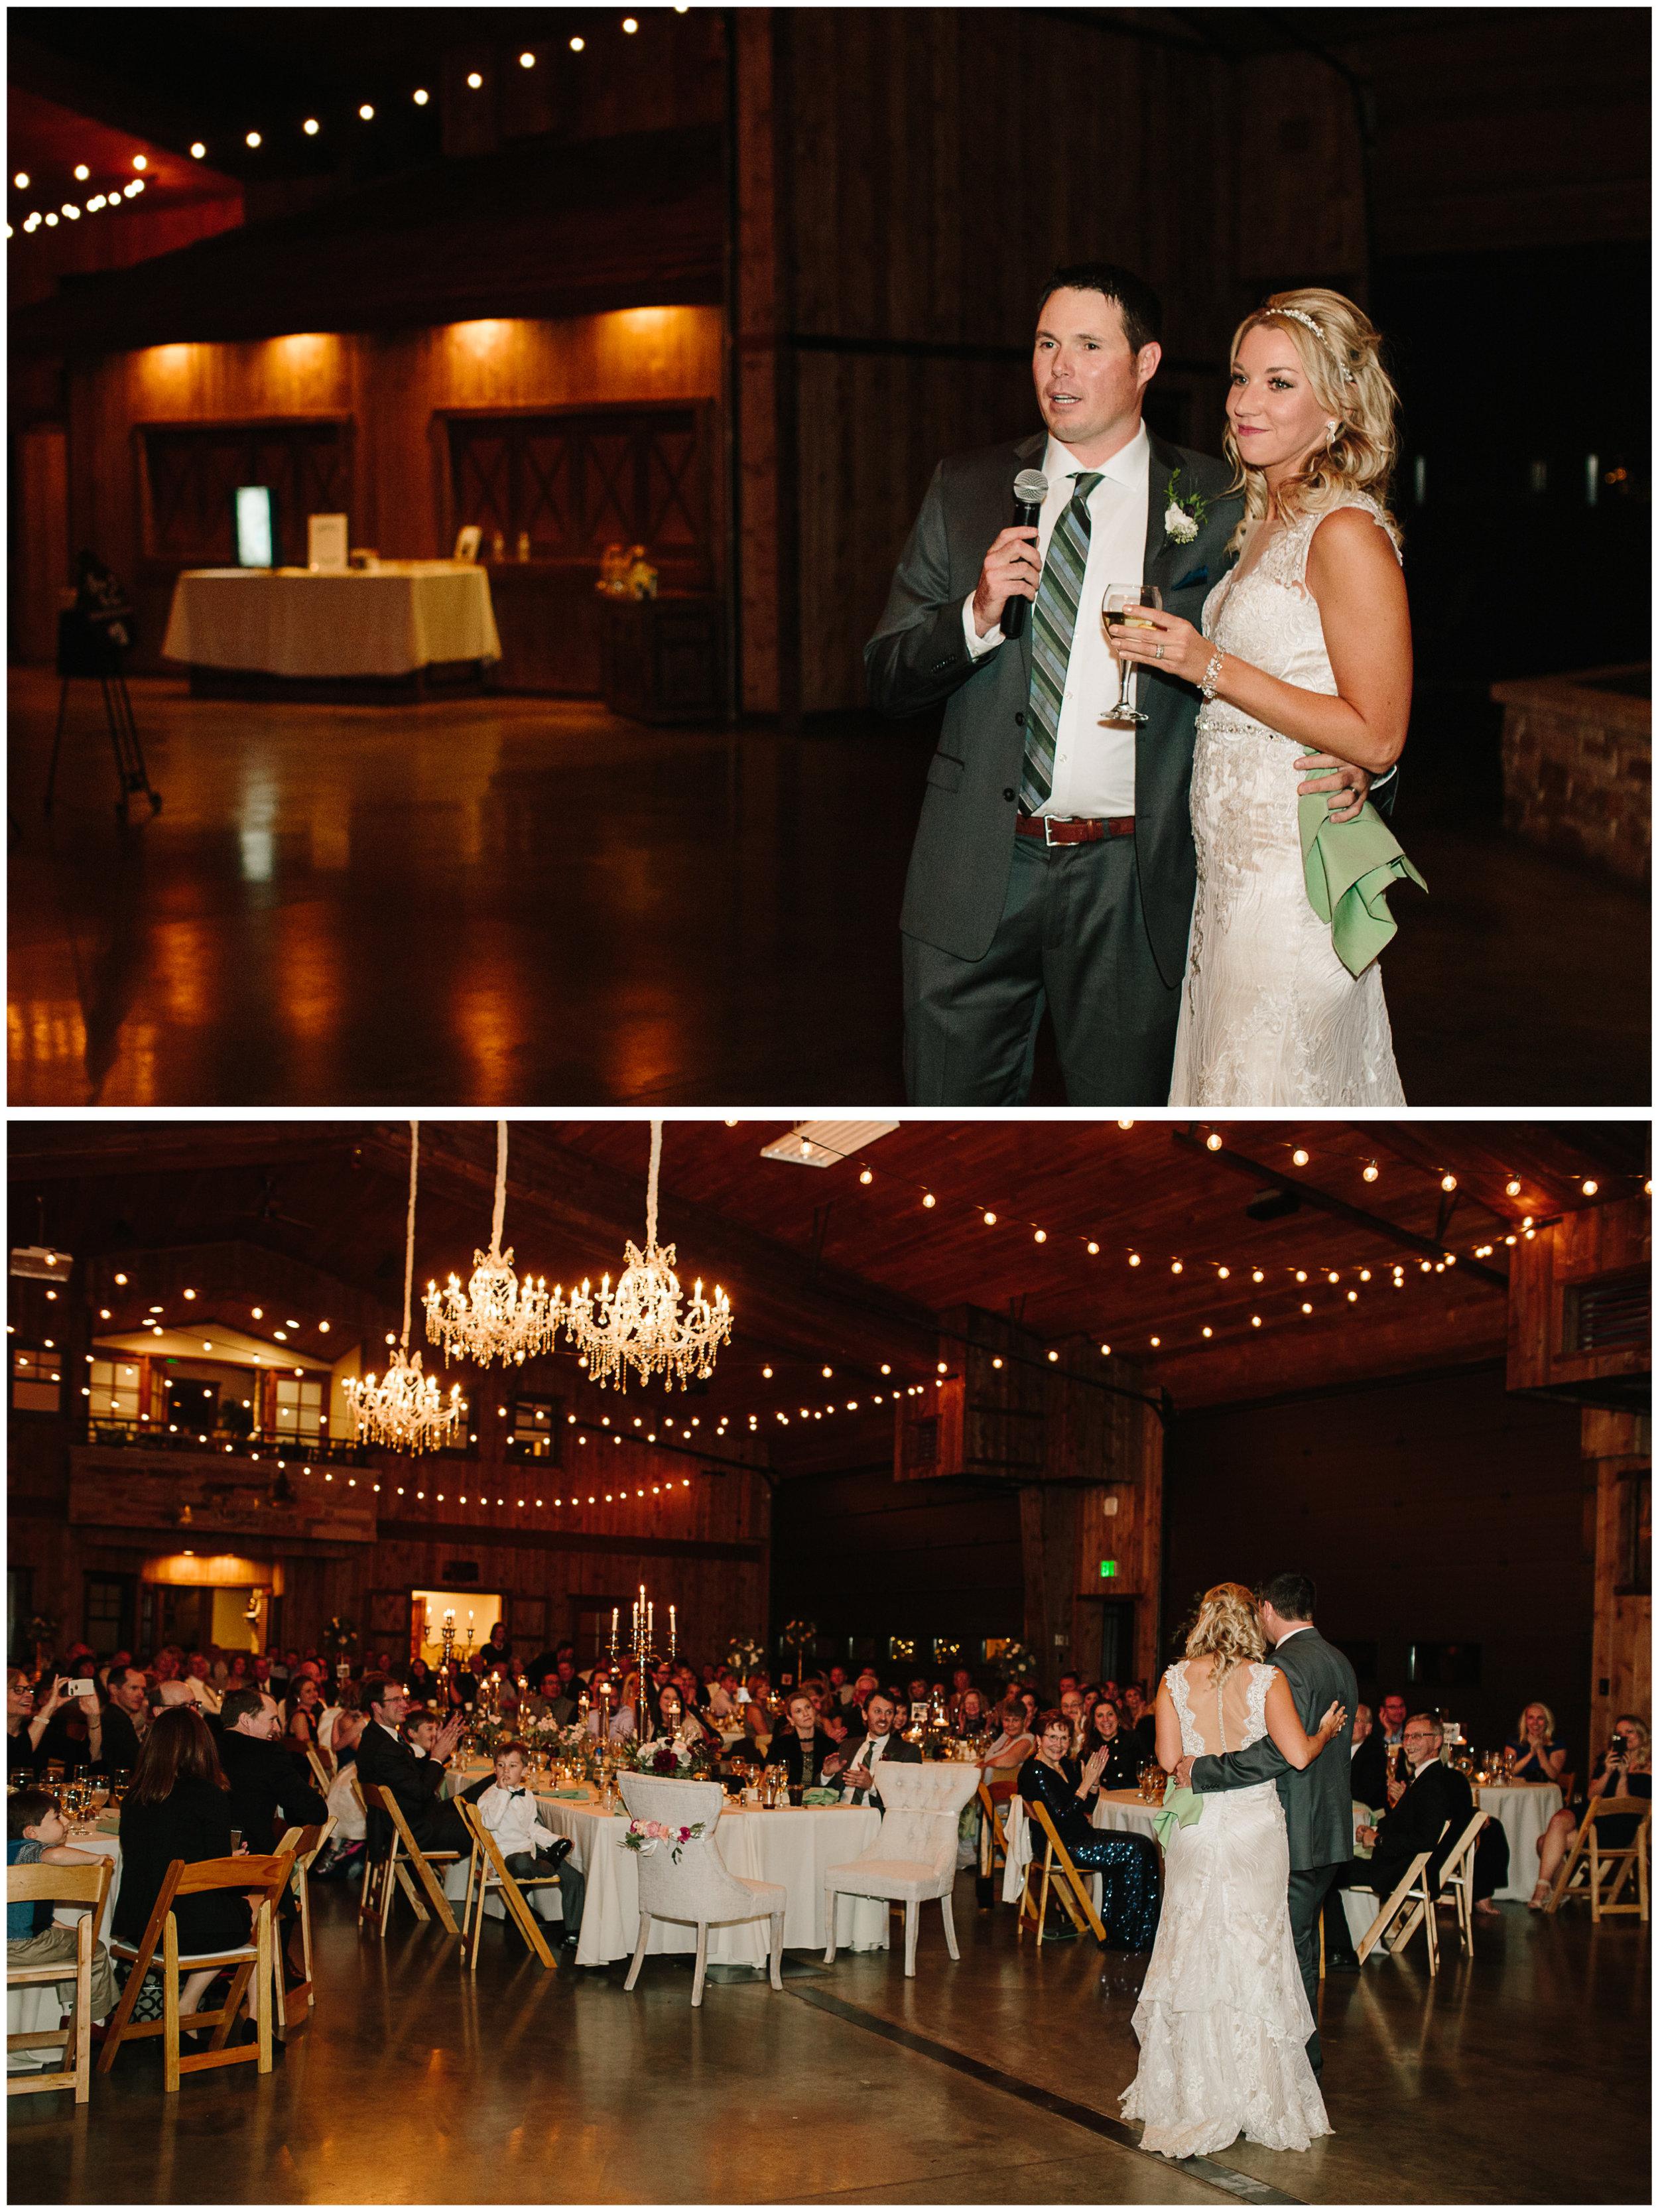 spruce_mountain_ranch_wedding_71.jpg